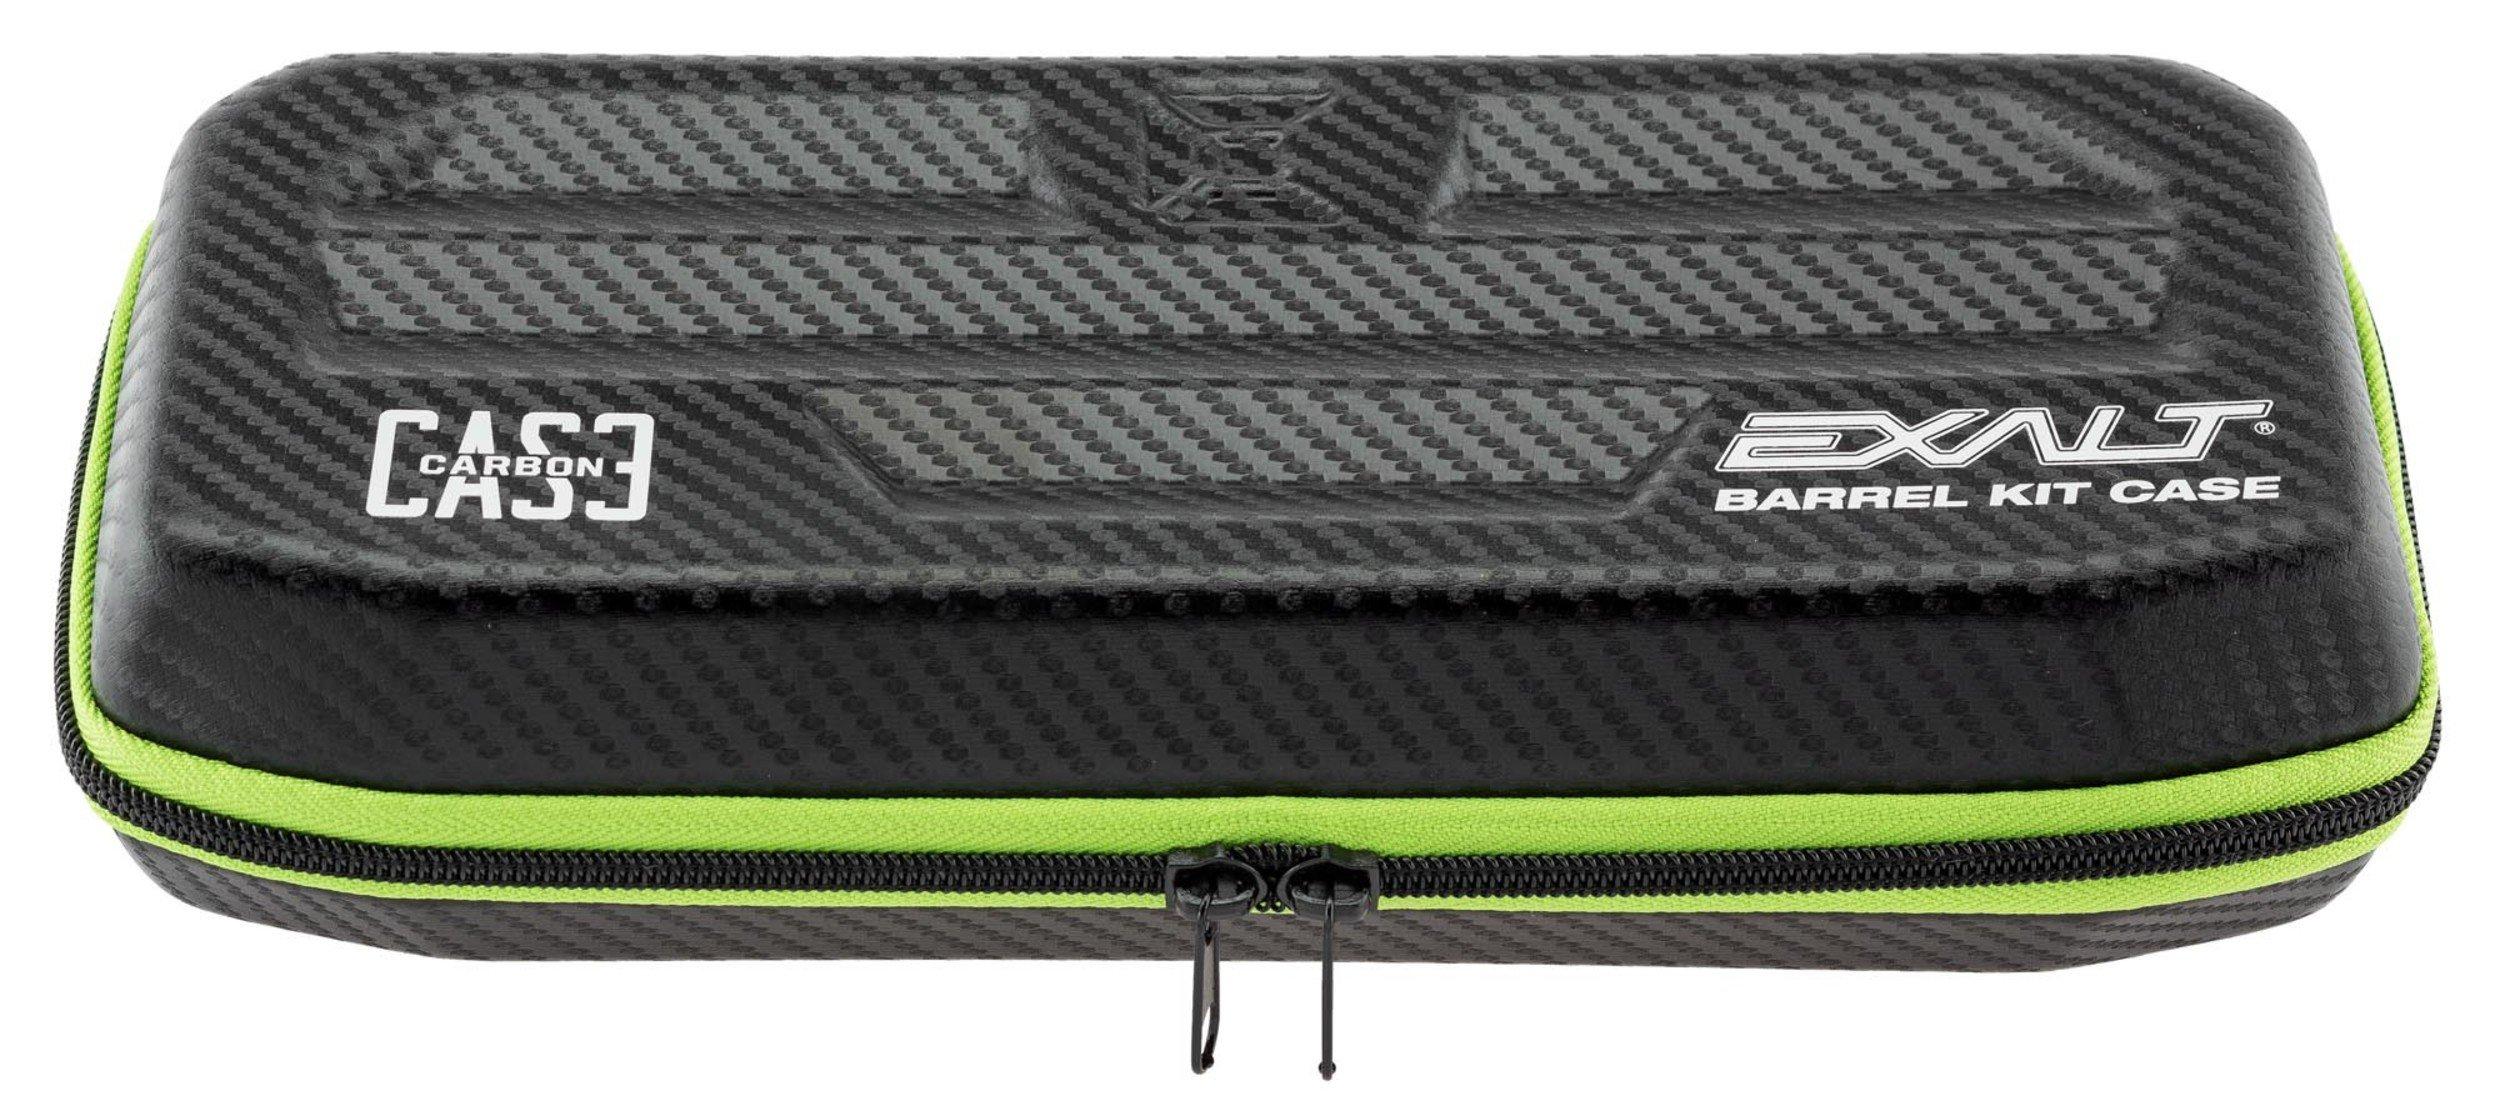 Exalt Paintball Carbon Series Barrel Case - Black/Lime by Exalt